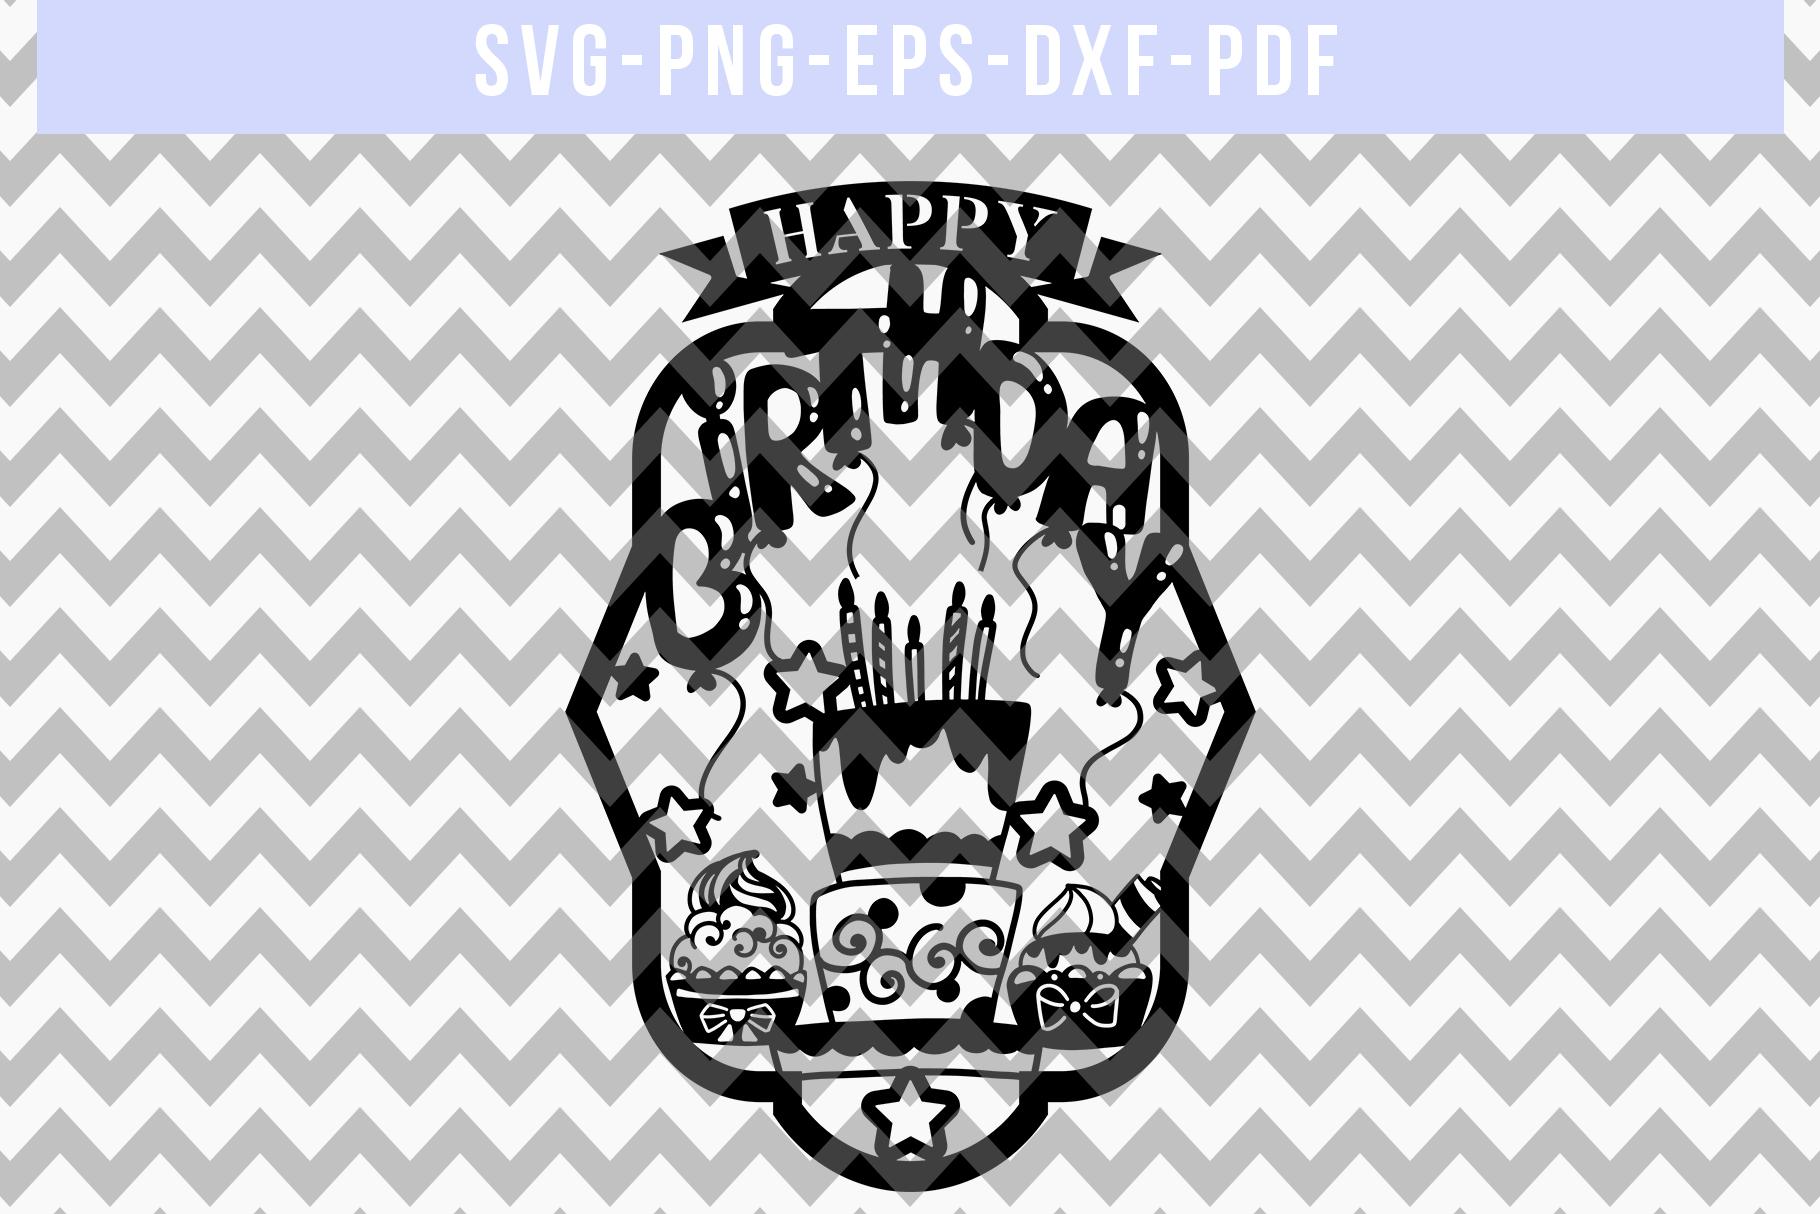 Happy Birthday Papercut Template, Diy Birthday Card SVG, PDF example image 4